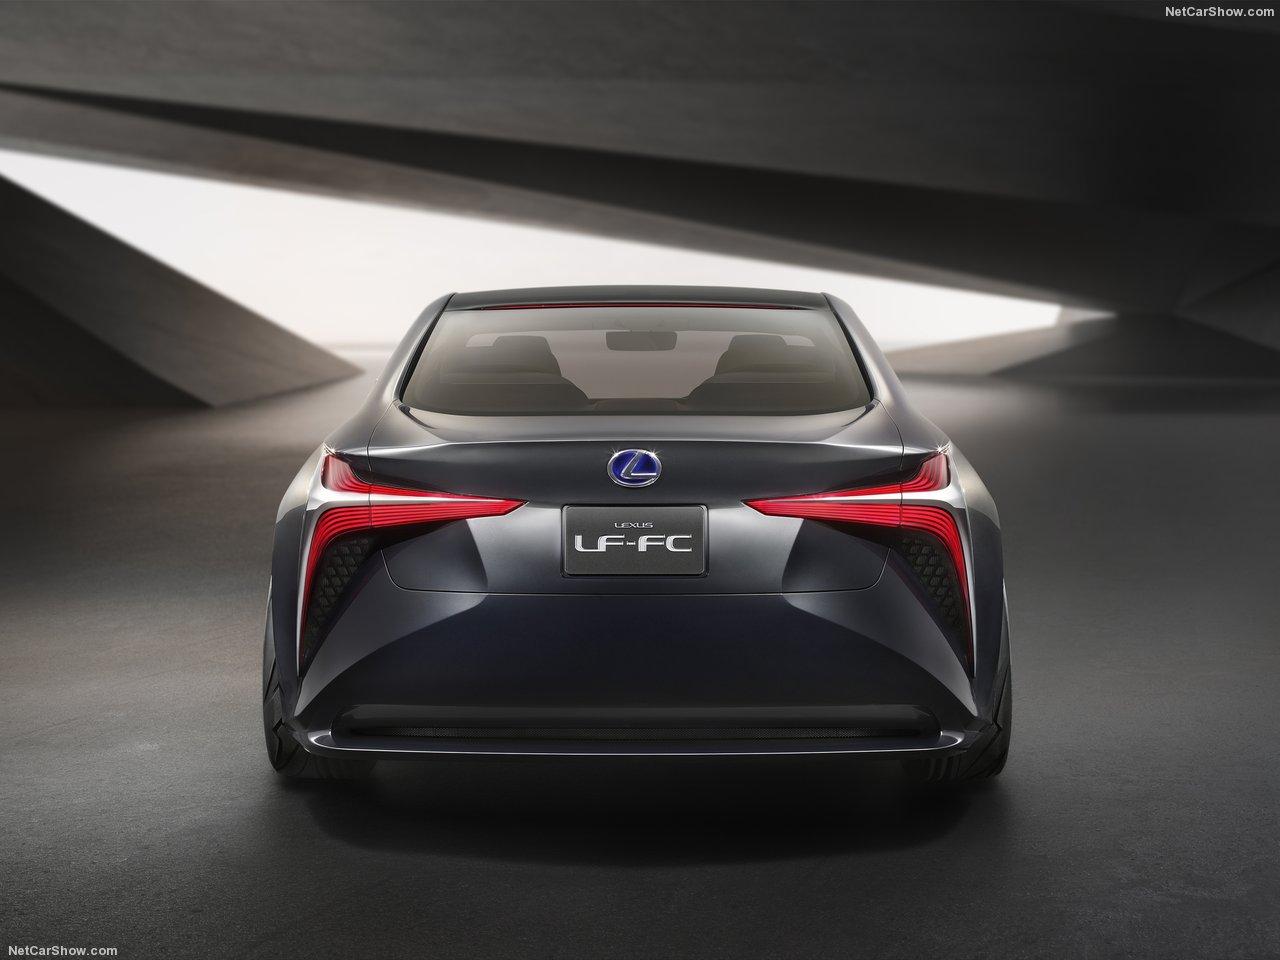 Lexus-LF-FC_Concept_2015_1280x960_wallpaper_06